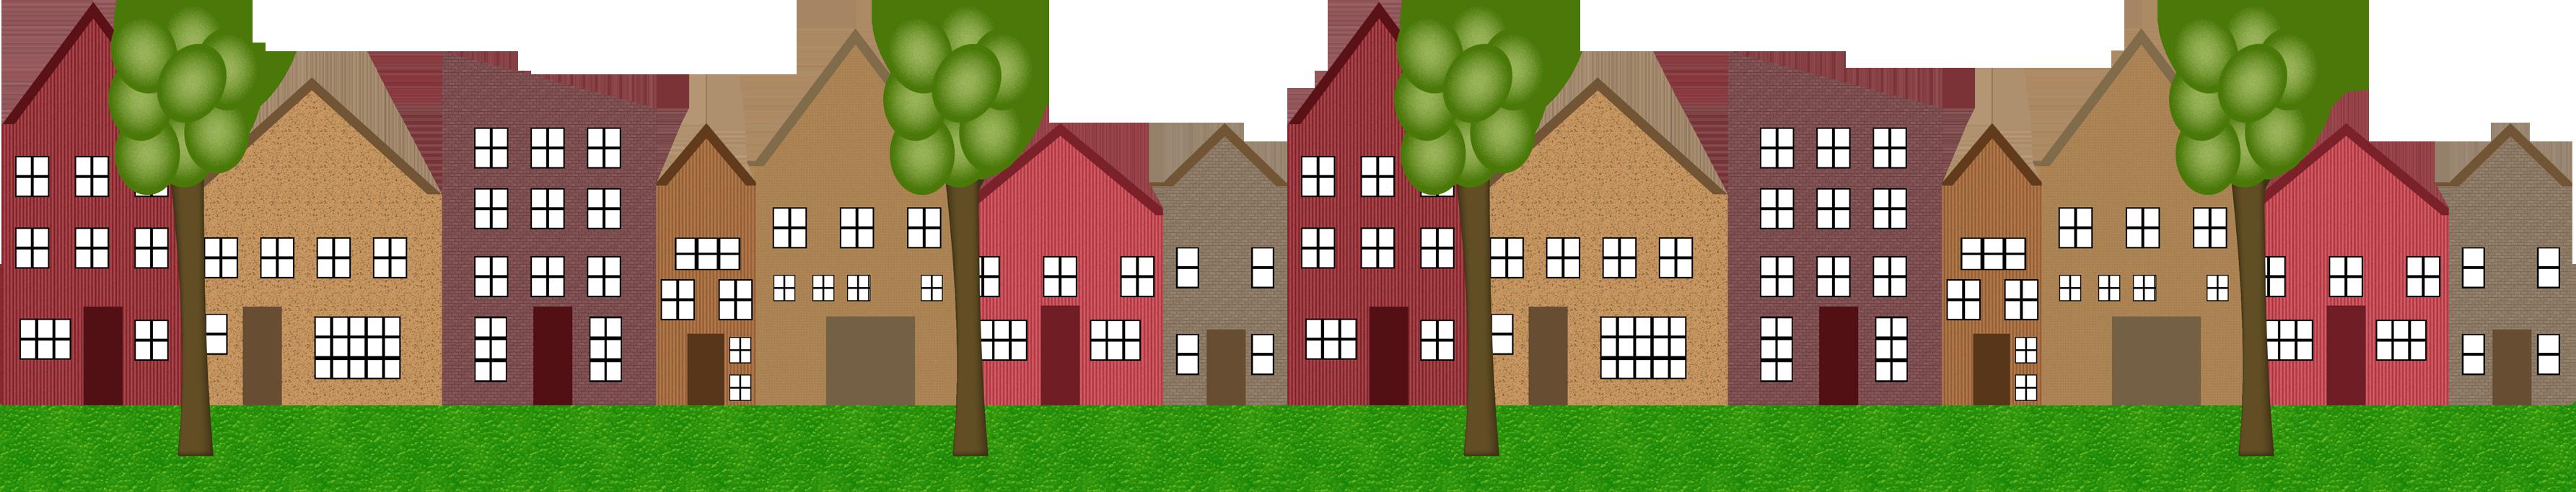 Row houses clipart clip art free stock Clip Art Of Homes In A Row Clipart - Clipart Kid clip art free stock